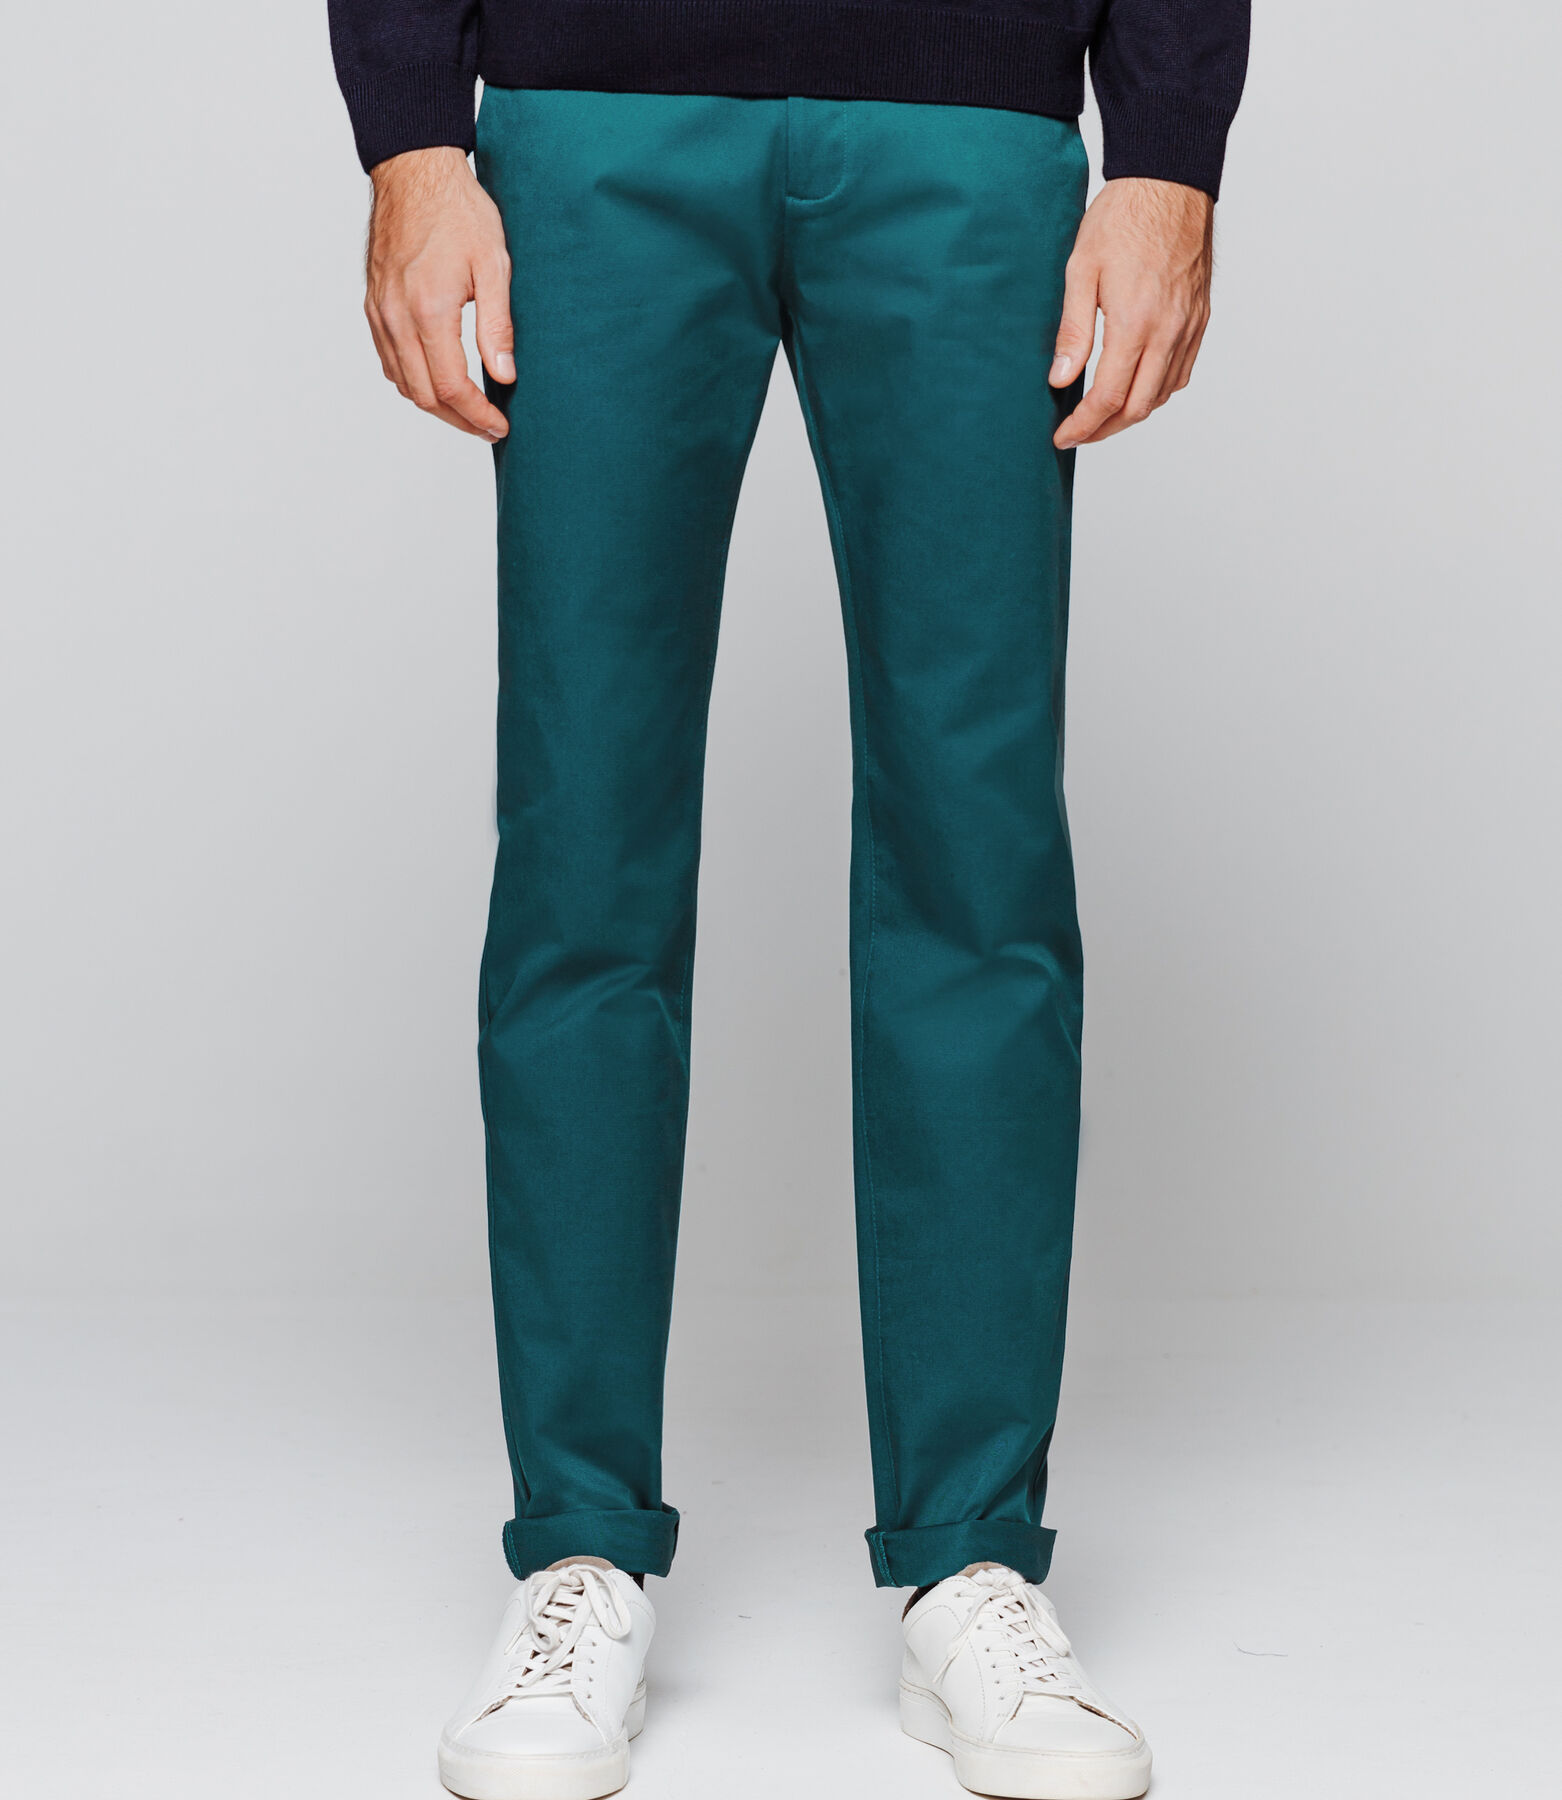 Pantalon Urbain Vert Canard